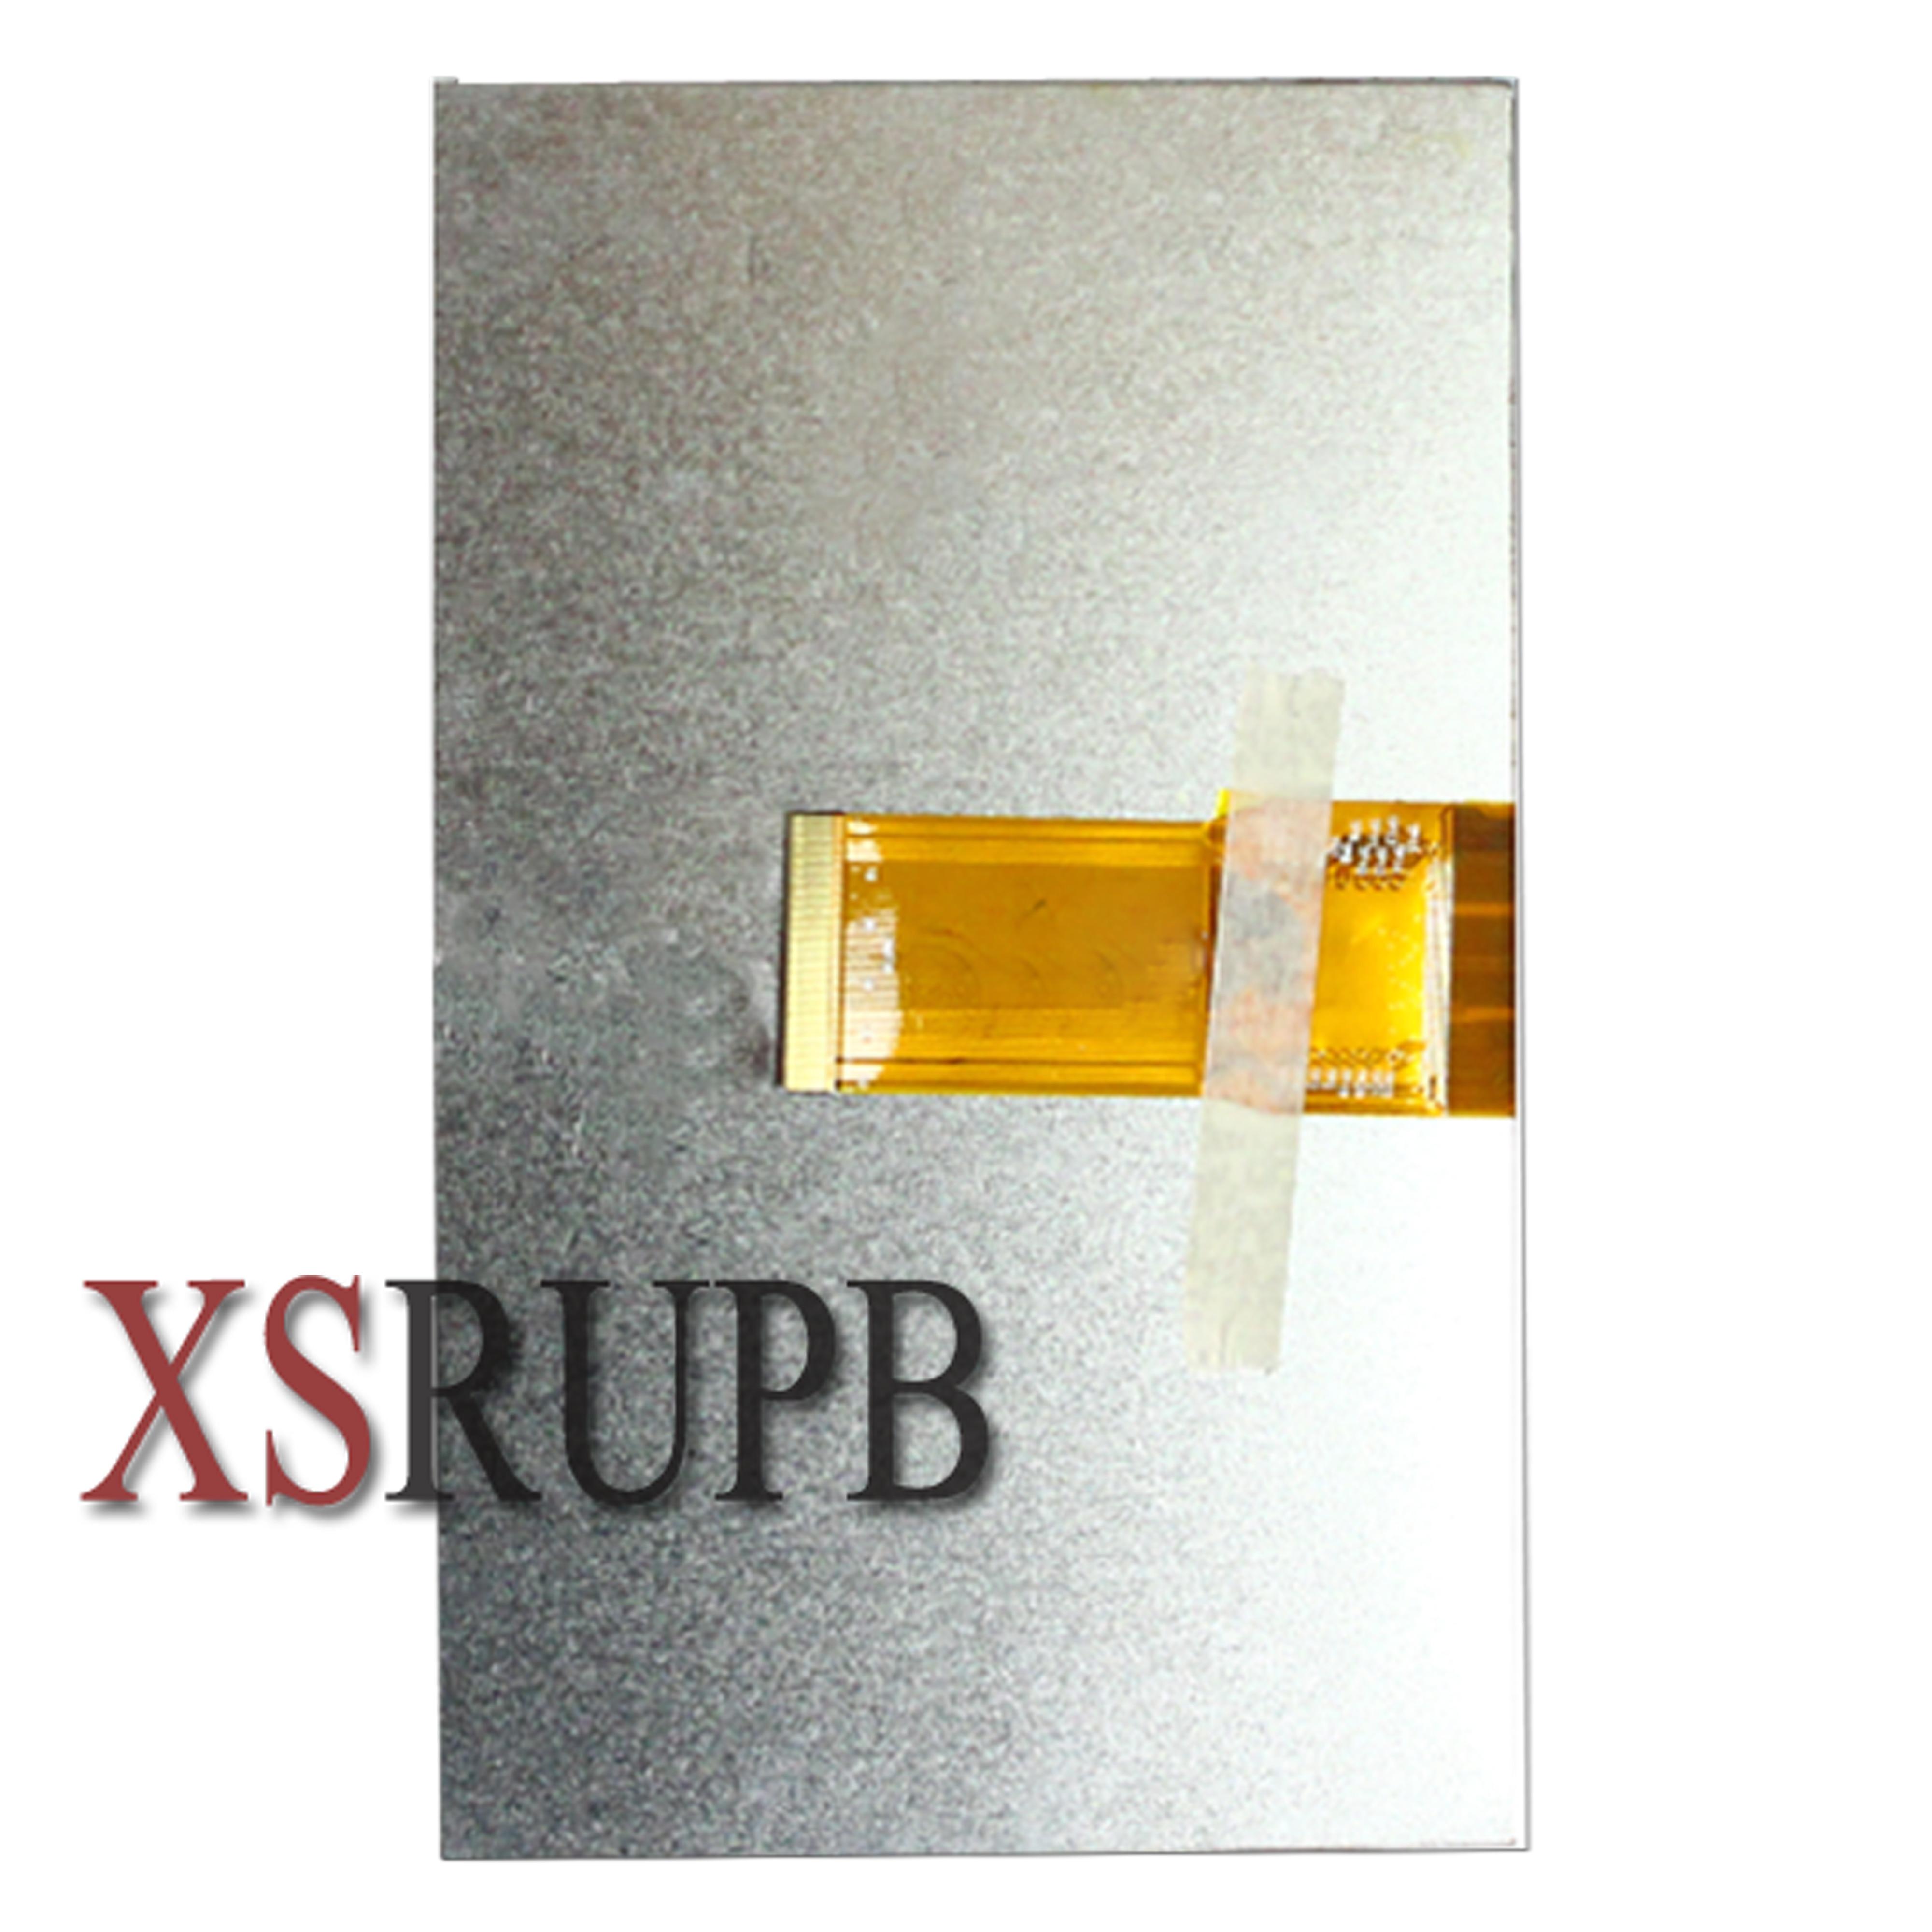 все цены на Original 7Inch 163*97mm 7300101463 E231732 HD 1024 * 600 LCD Display Screen for Cube U25GT Tablet LCDs & Panels Free Shipping онлайн